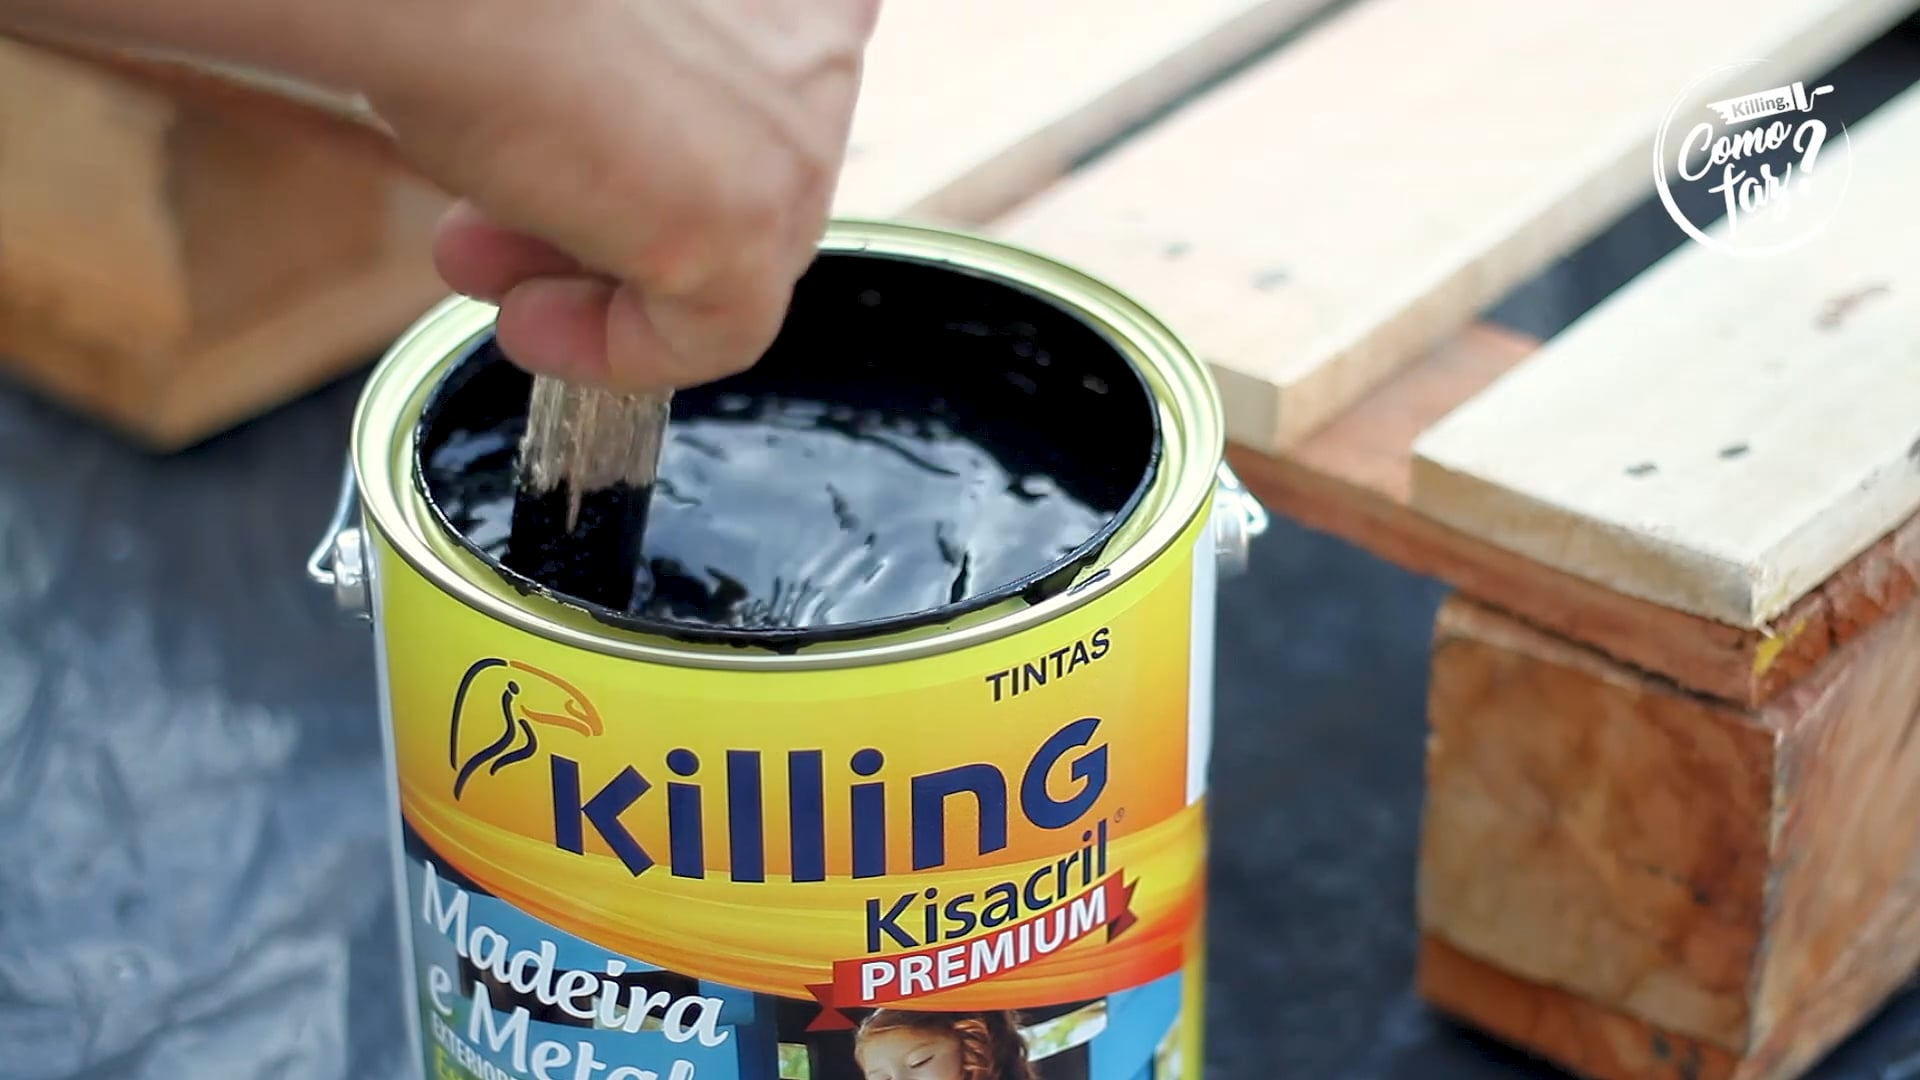 Tintas Killing - Como faz? Sofá de Palete